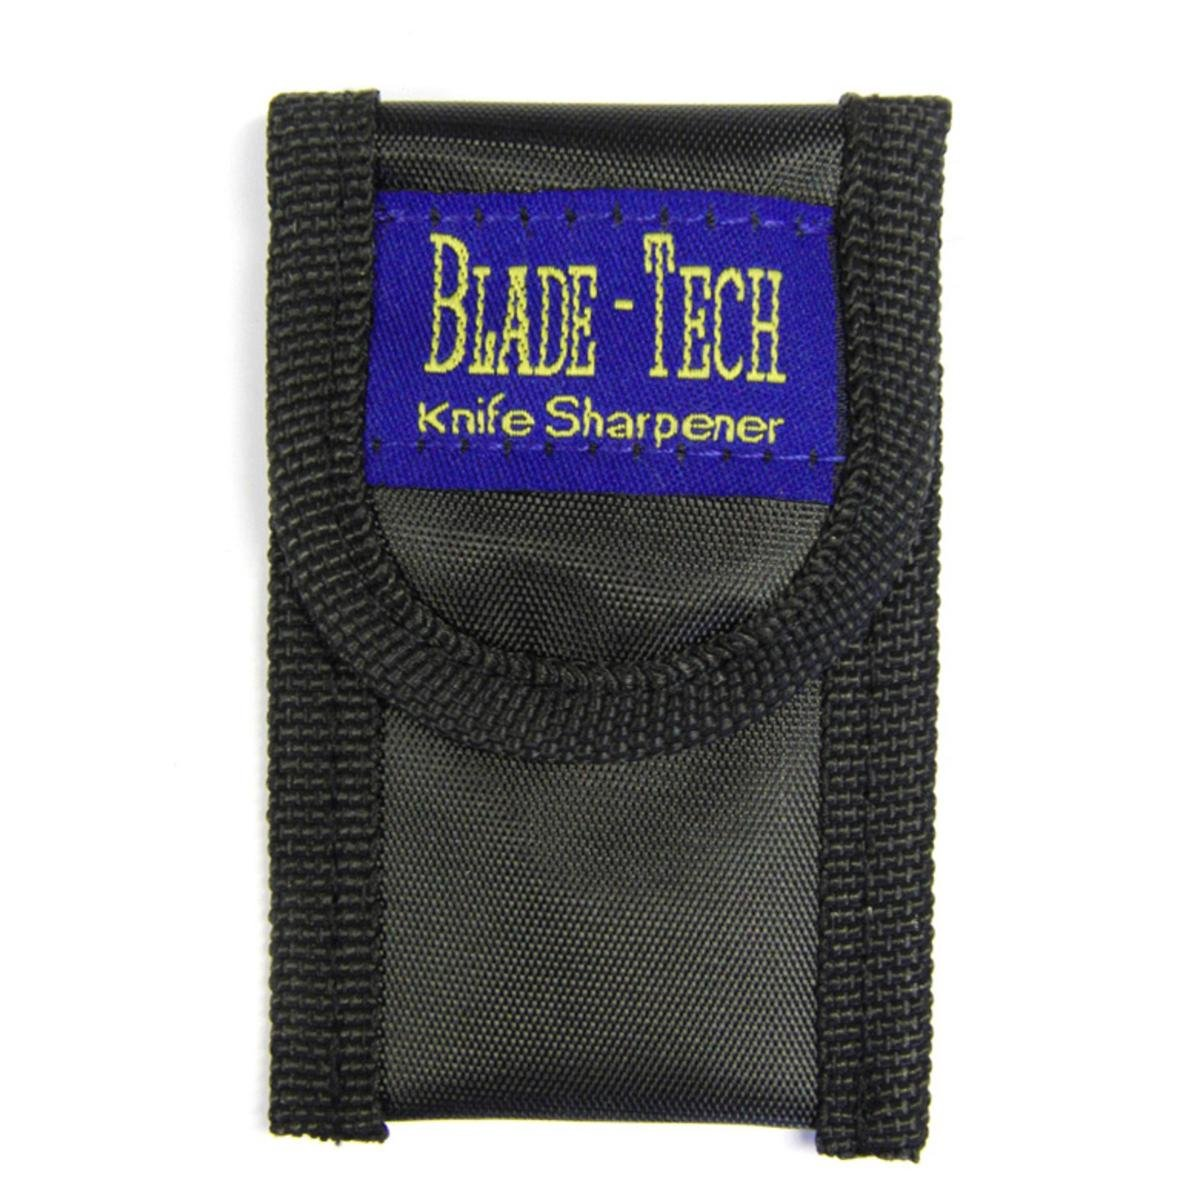 Blade Tech Knife and Tool Sharpener (Black) Casstrom